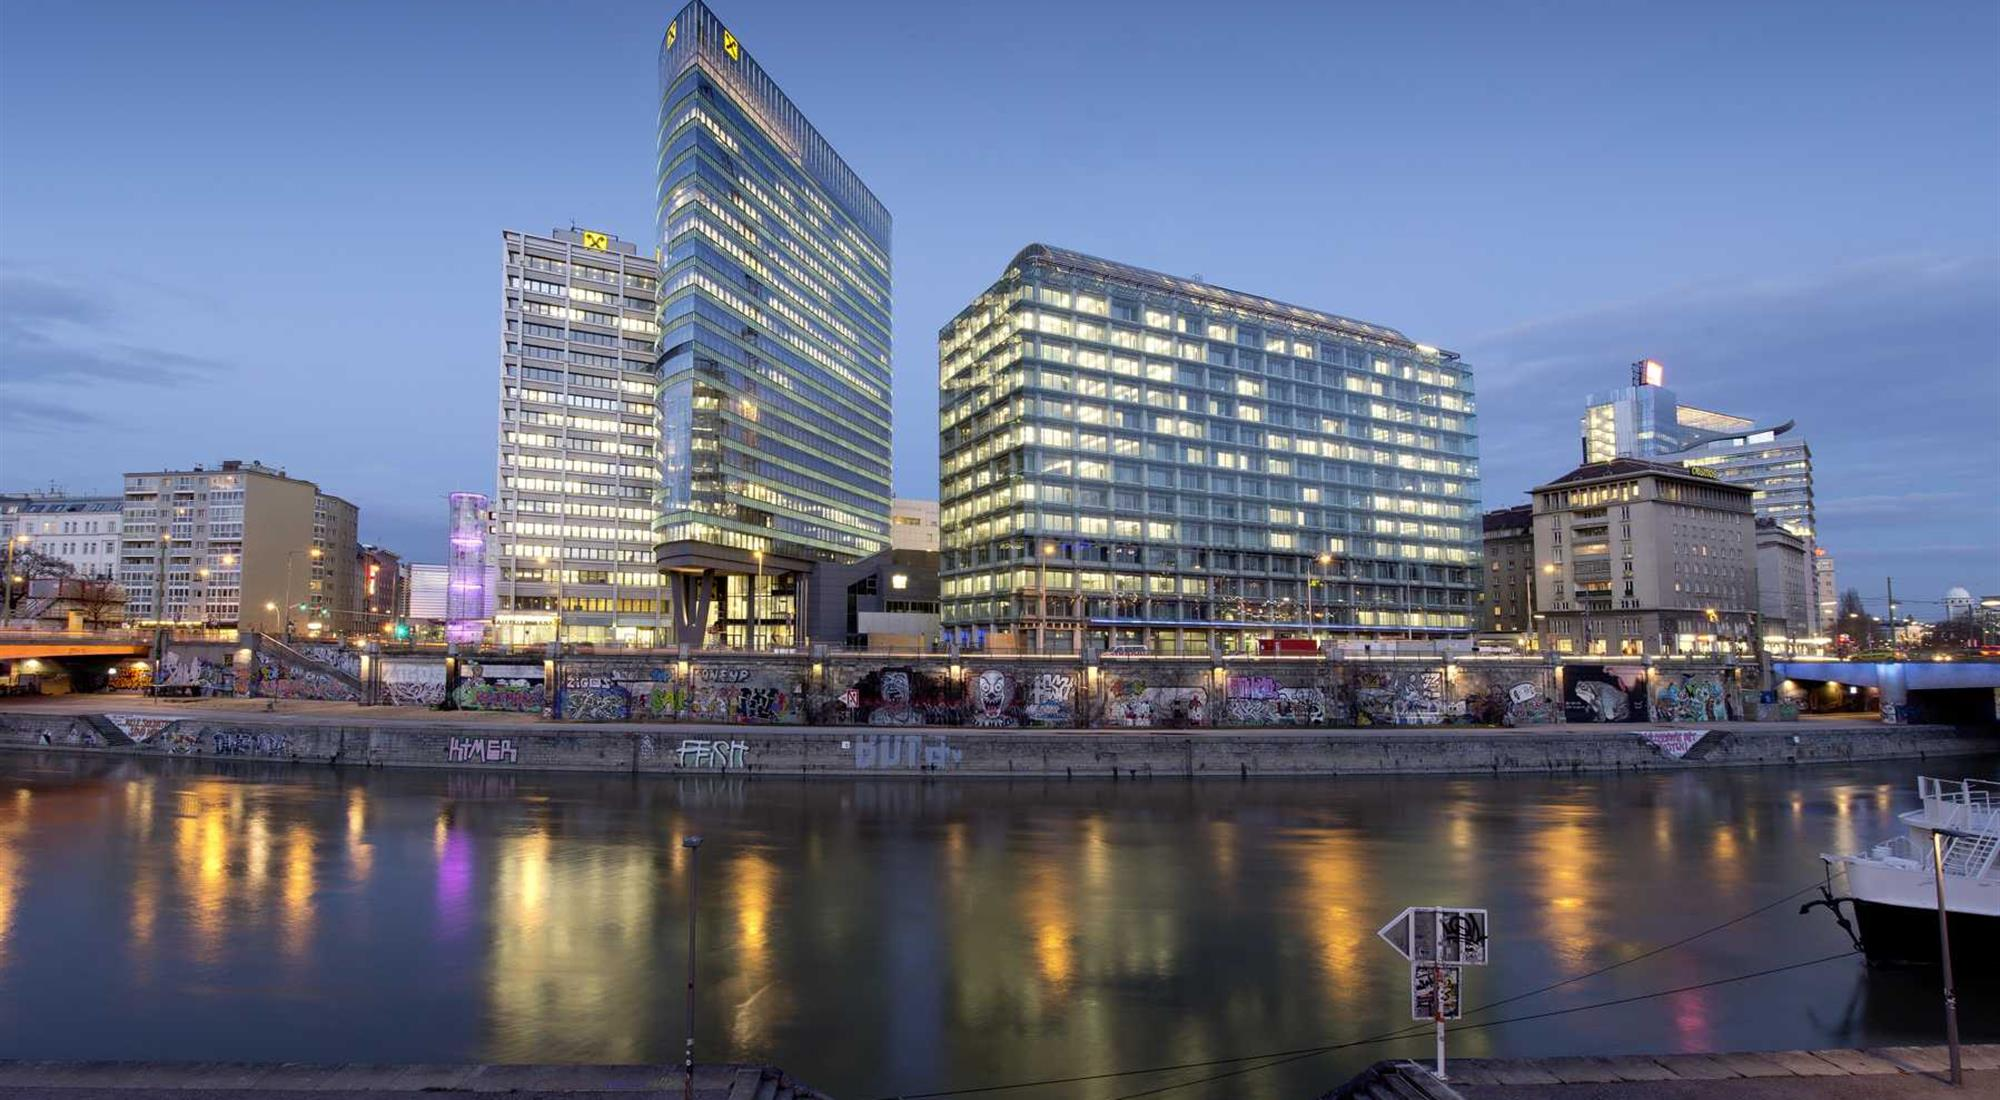 https://alukoenigstahl.md/wp-content/uploads/sites/4/2020/09/2013-02-EOD-Tower-Wien-13.jpg